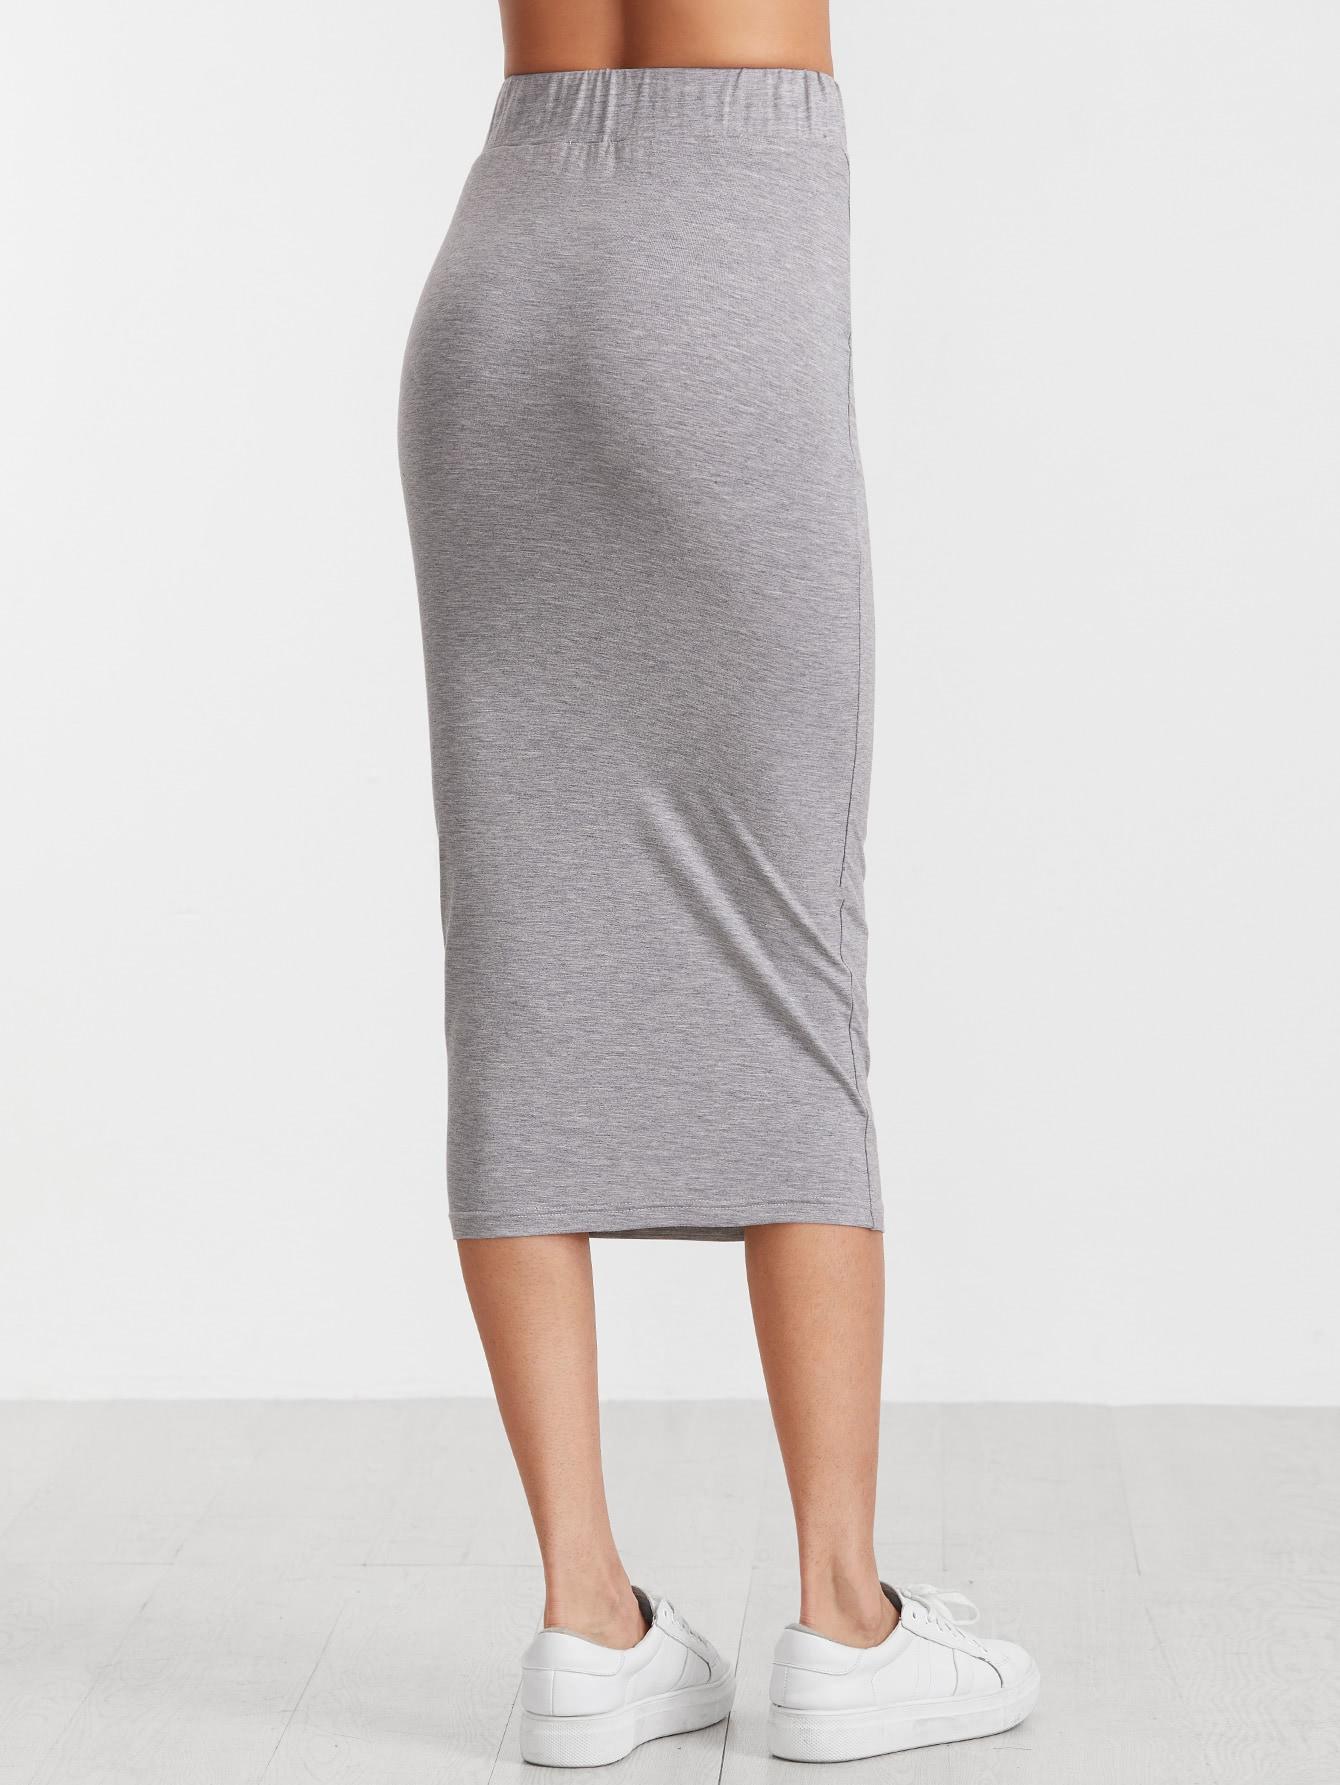 grey elastic waist midi pencil skirt